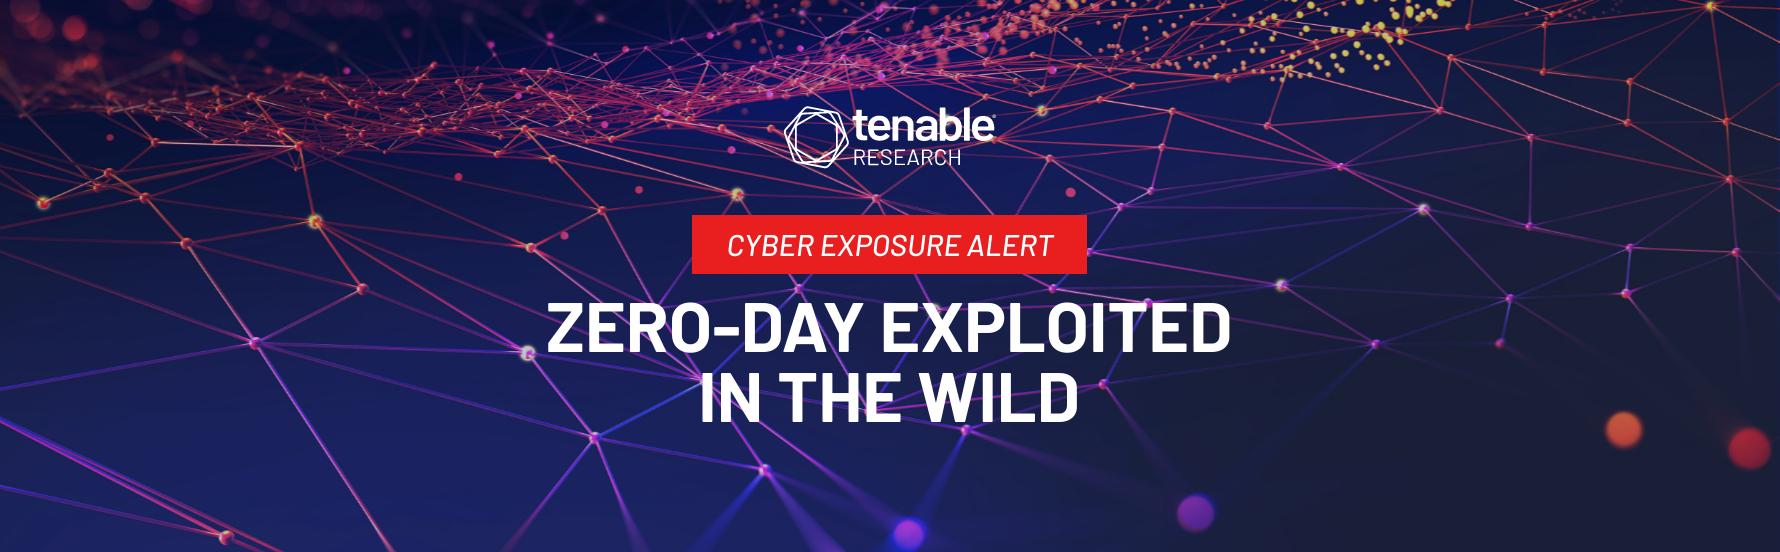 CVE-2021-30116: Multiple Zero-Day Vulnerabilities in Kaseya VSA Exploited to Distribute REvil Ransomware